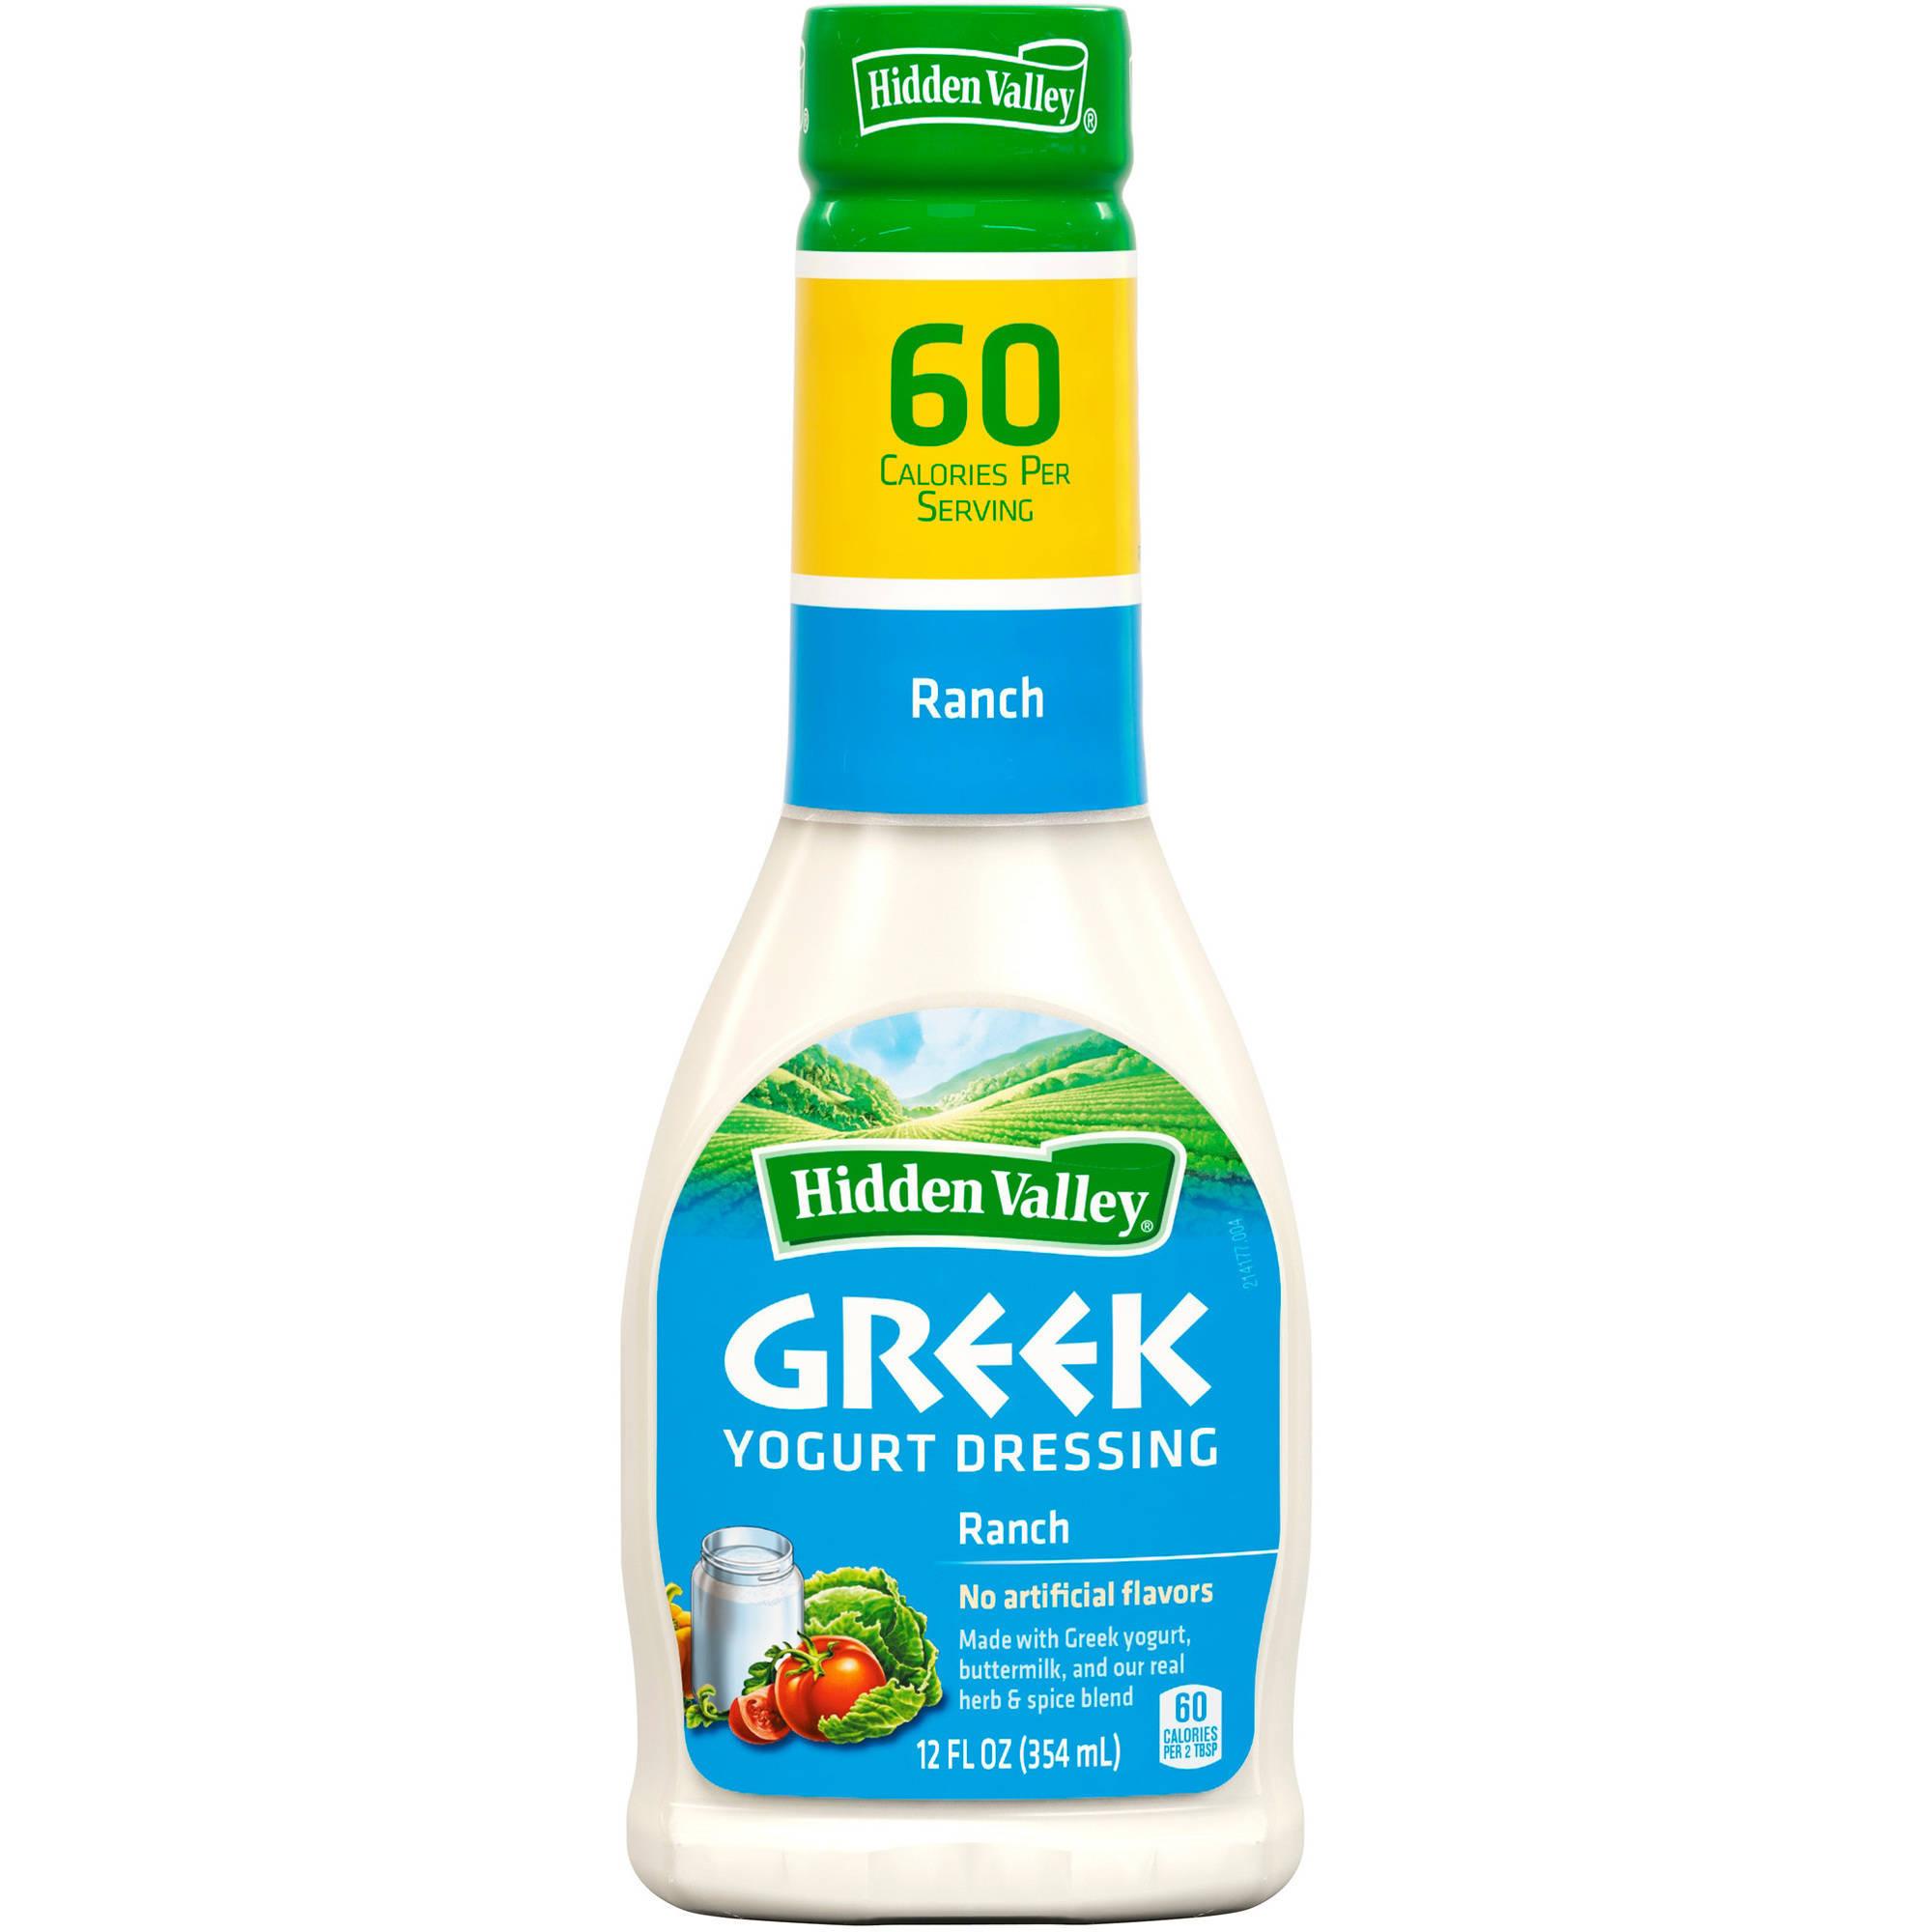 Hidden Valley Ranch Greek Yogurt Dressing, 12 fl oz